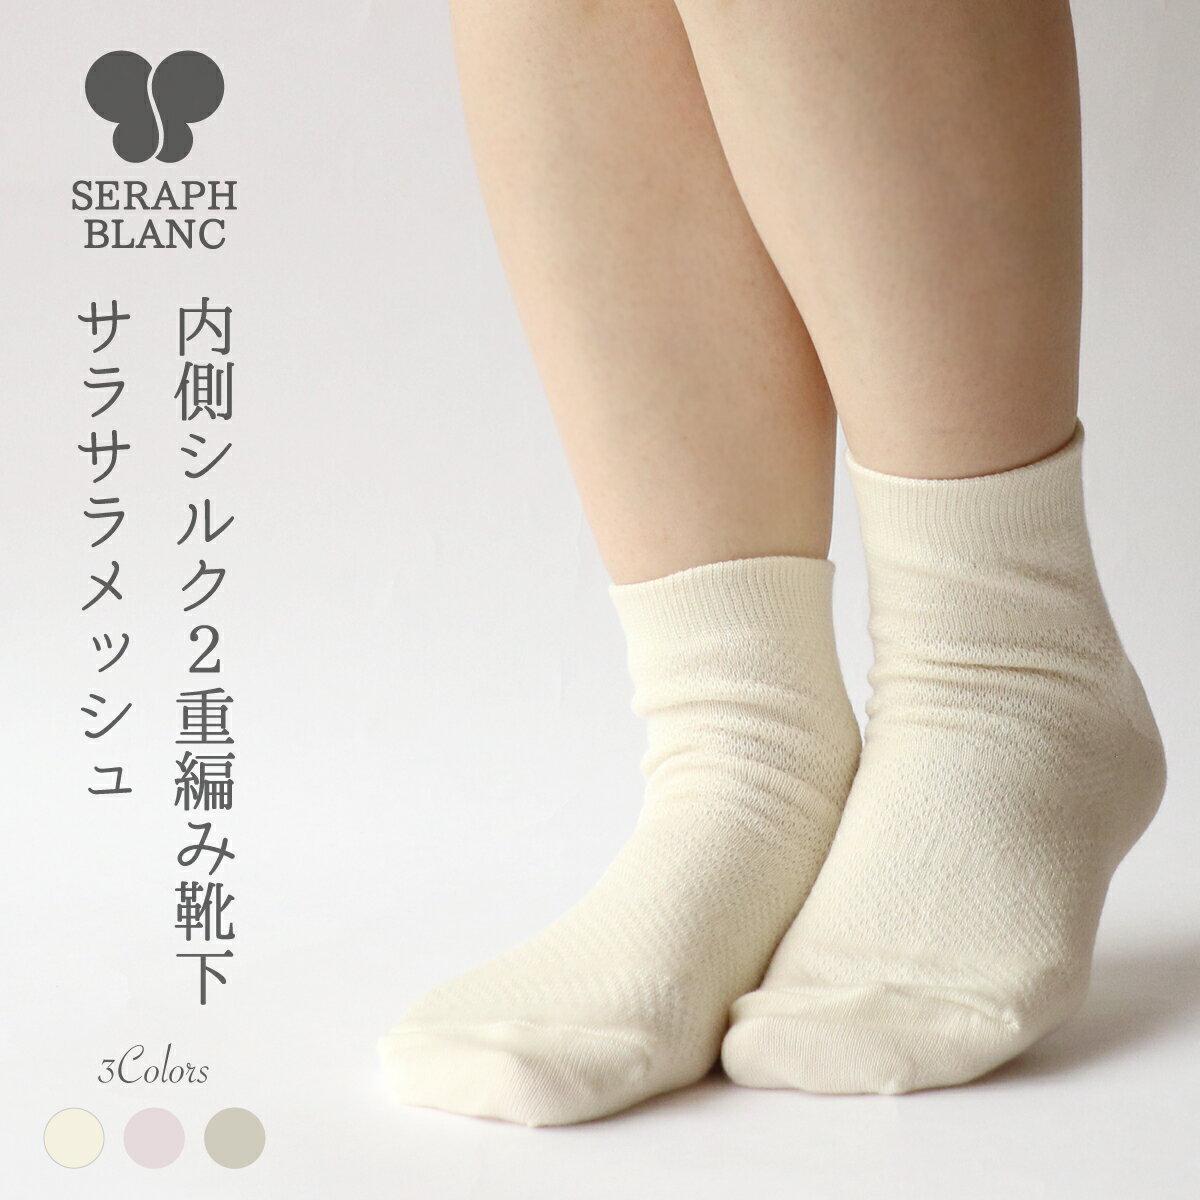 【SERAPH BLANC】 内側シルク2重編み靴下 さらさらメッシュ (5189) シルク レーヨンシルク 冷えとり 靴下 ソックス 冷え取り レディース 女性 日本製 メッシュ 2重編み 接触冷感 爽やか 快適 可愛い かわいい お洒落 おしゃれ 母の日